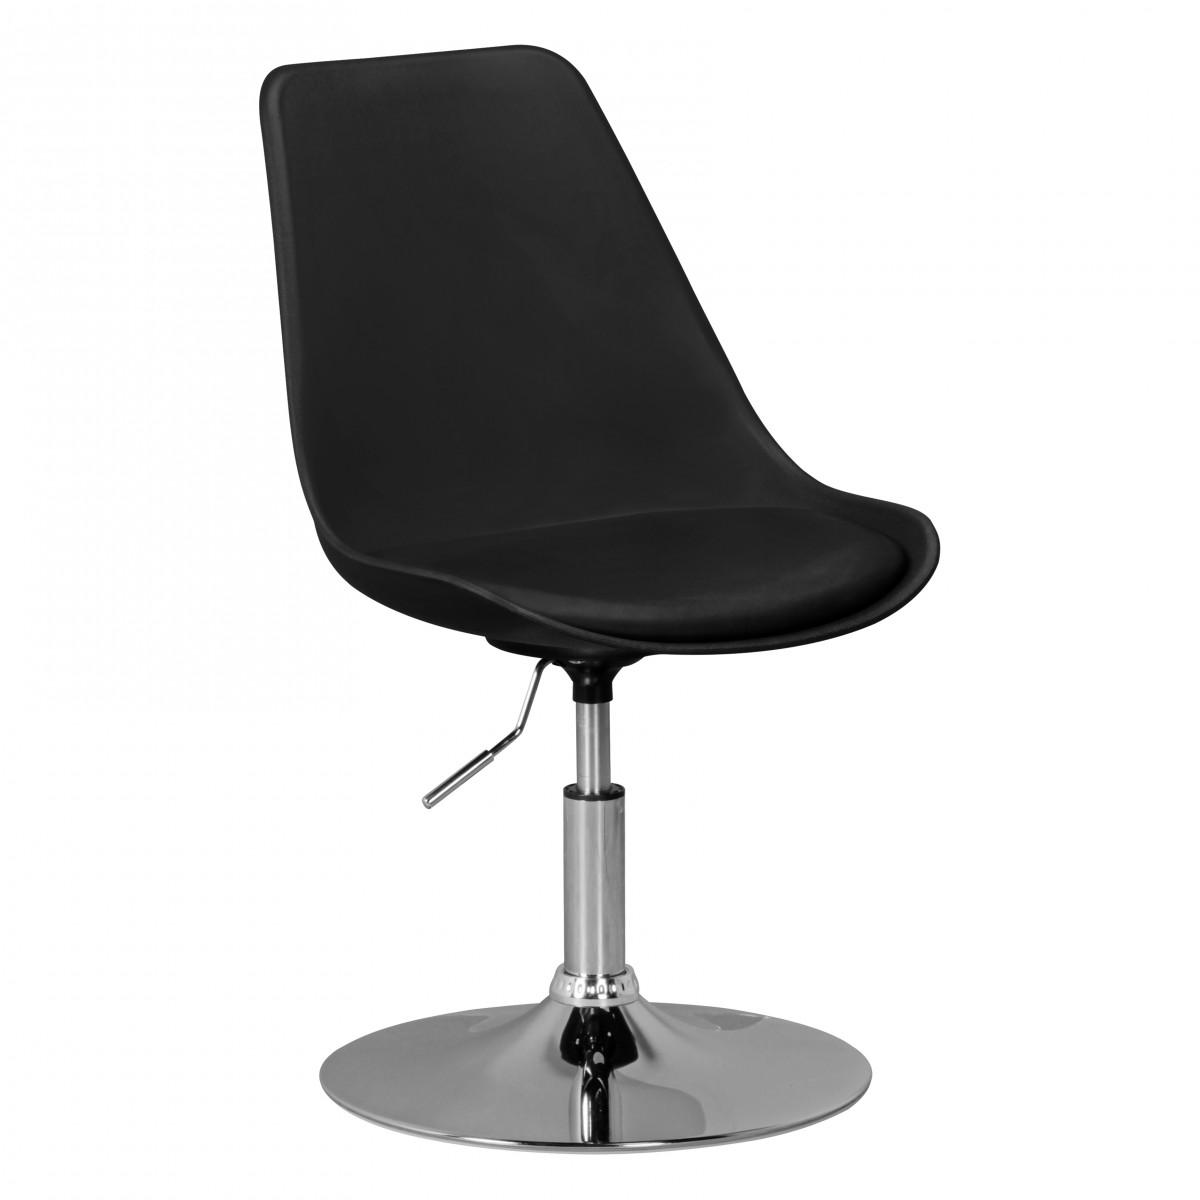 Finebuy hainan asiento giratorio de tela de la silla for Altura silla